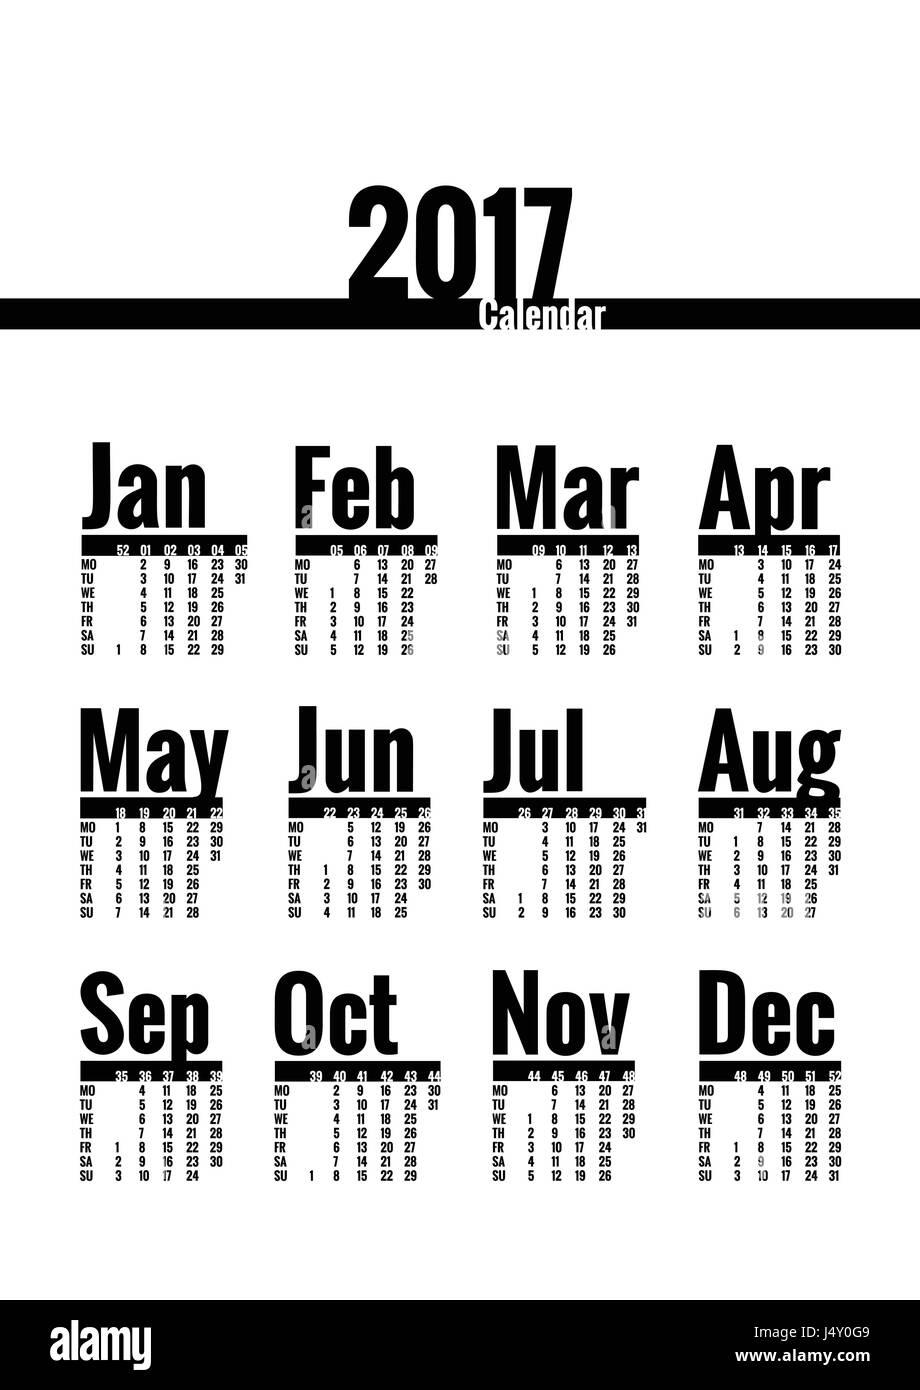 wallpapers 2017 Poster Calendar Template alamy